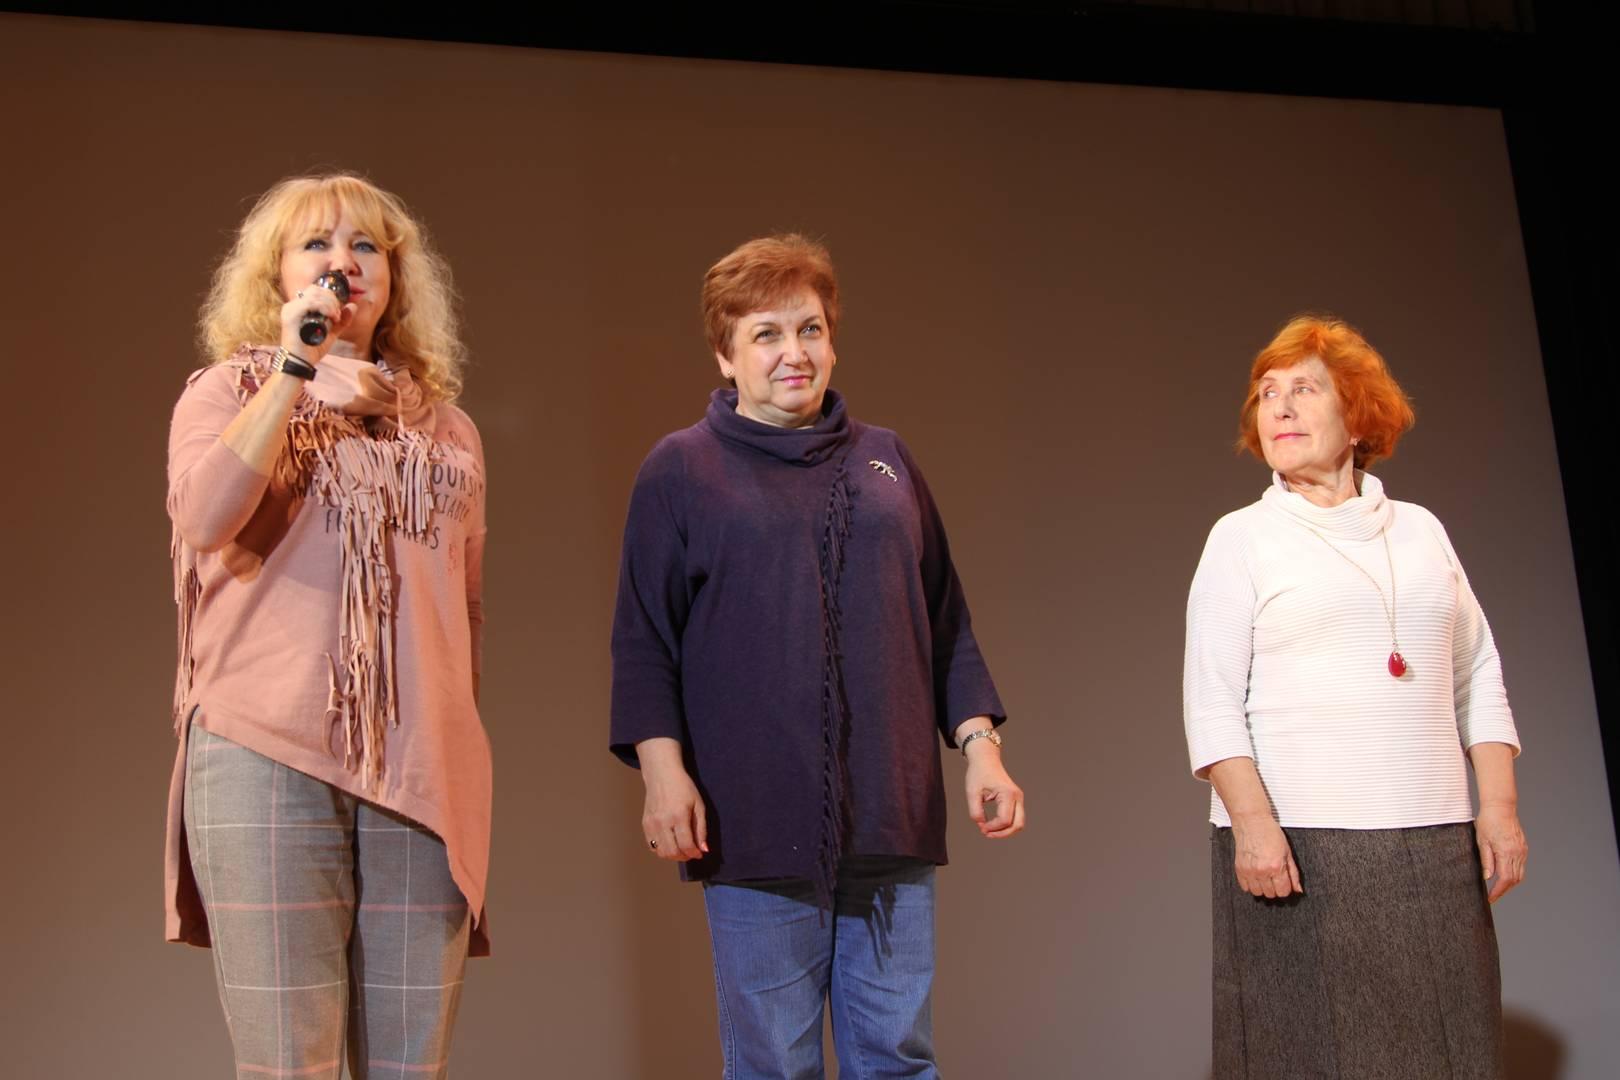 Слева направо: Кеслер Надежда Алексеевна, Лежнева Софья Соломоновна, Ончурова Нелли Константиновна